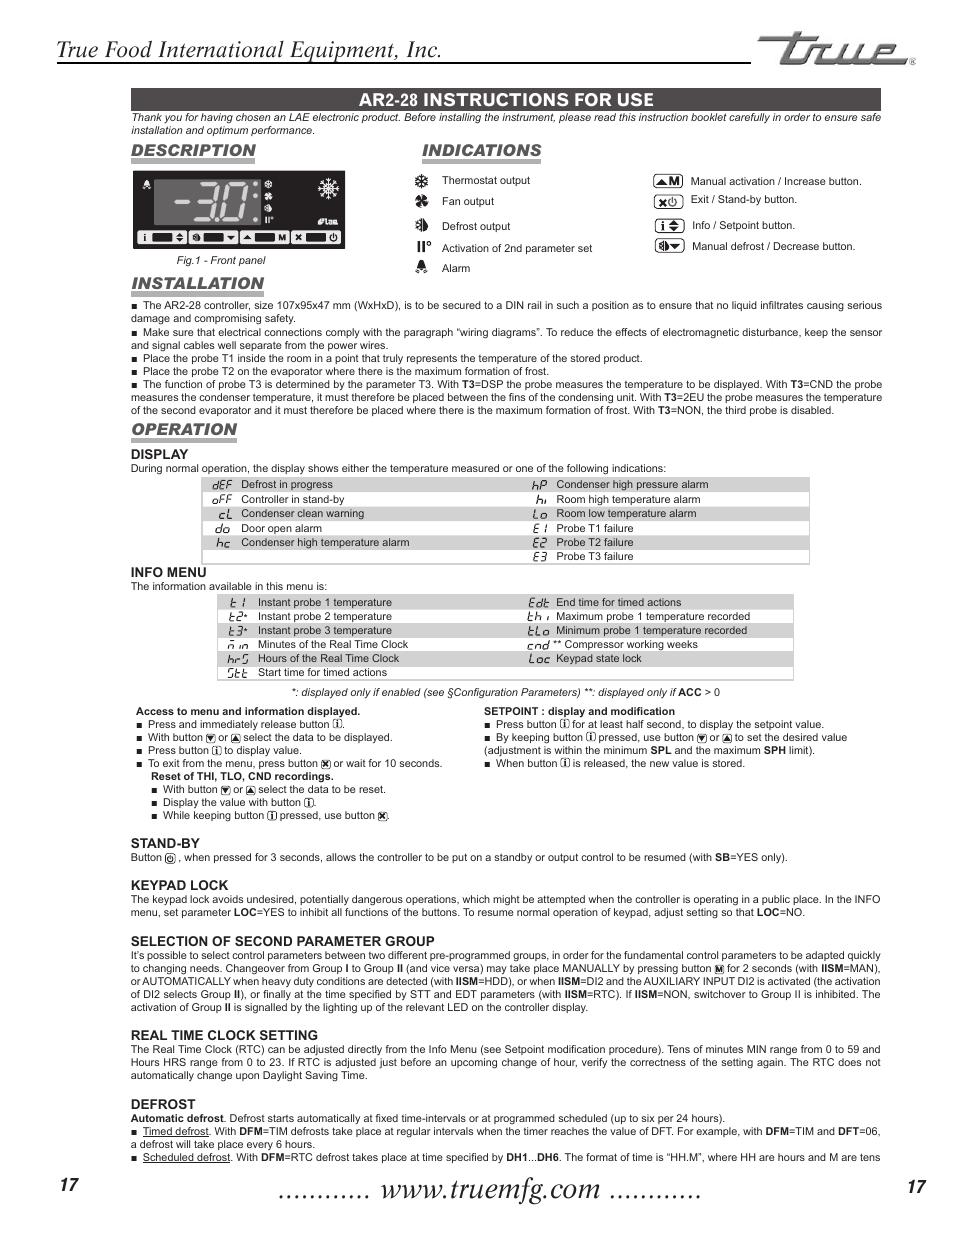 True food international equipment, inc, Ar2-28 instructions for use ...